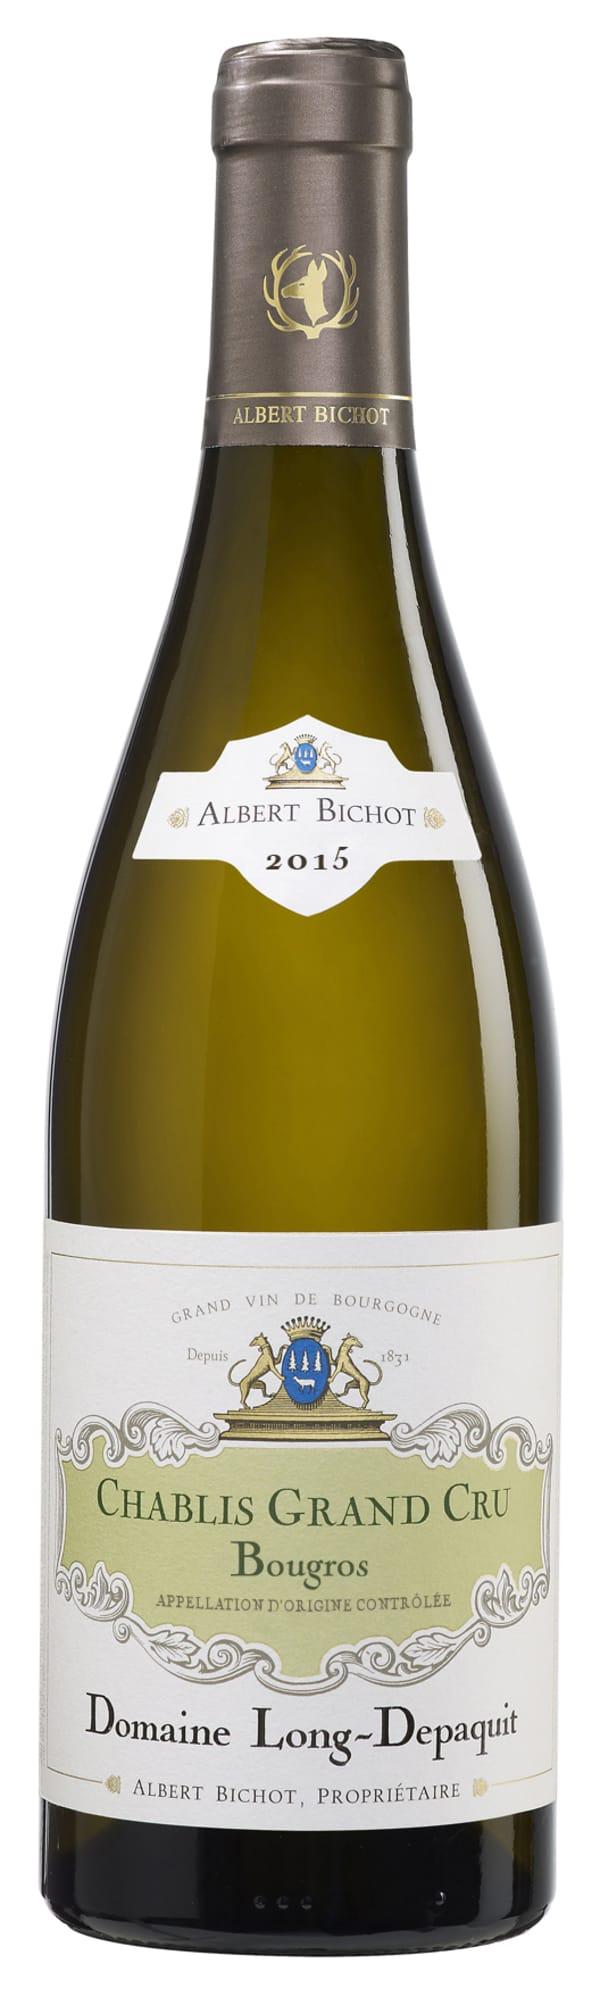 Albert Bichot Domaine Long-Depaquit Chablis Grand Cru Bougros 2015